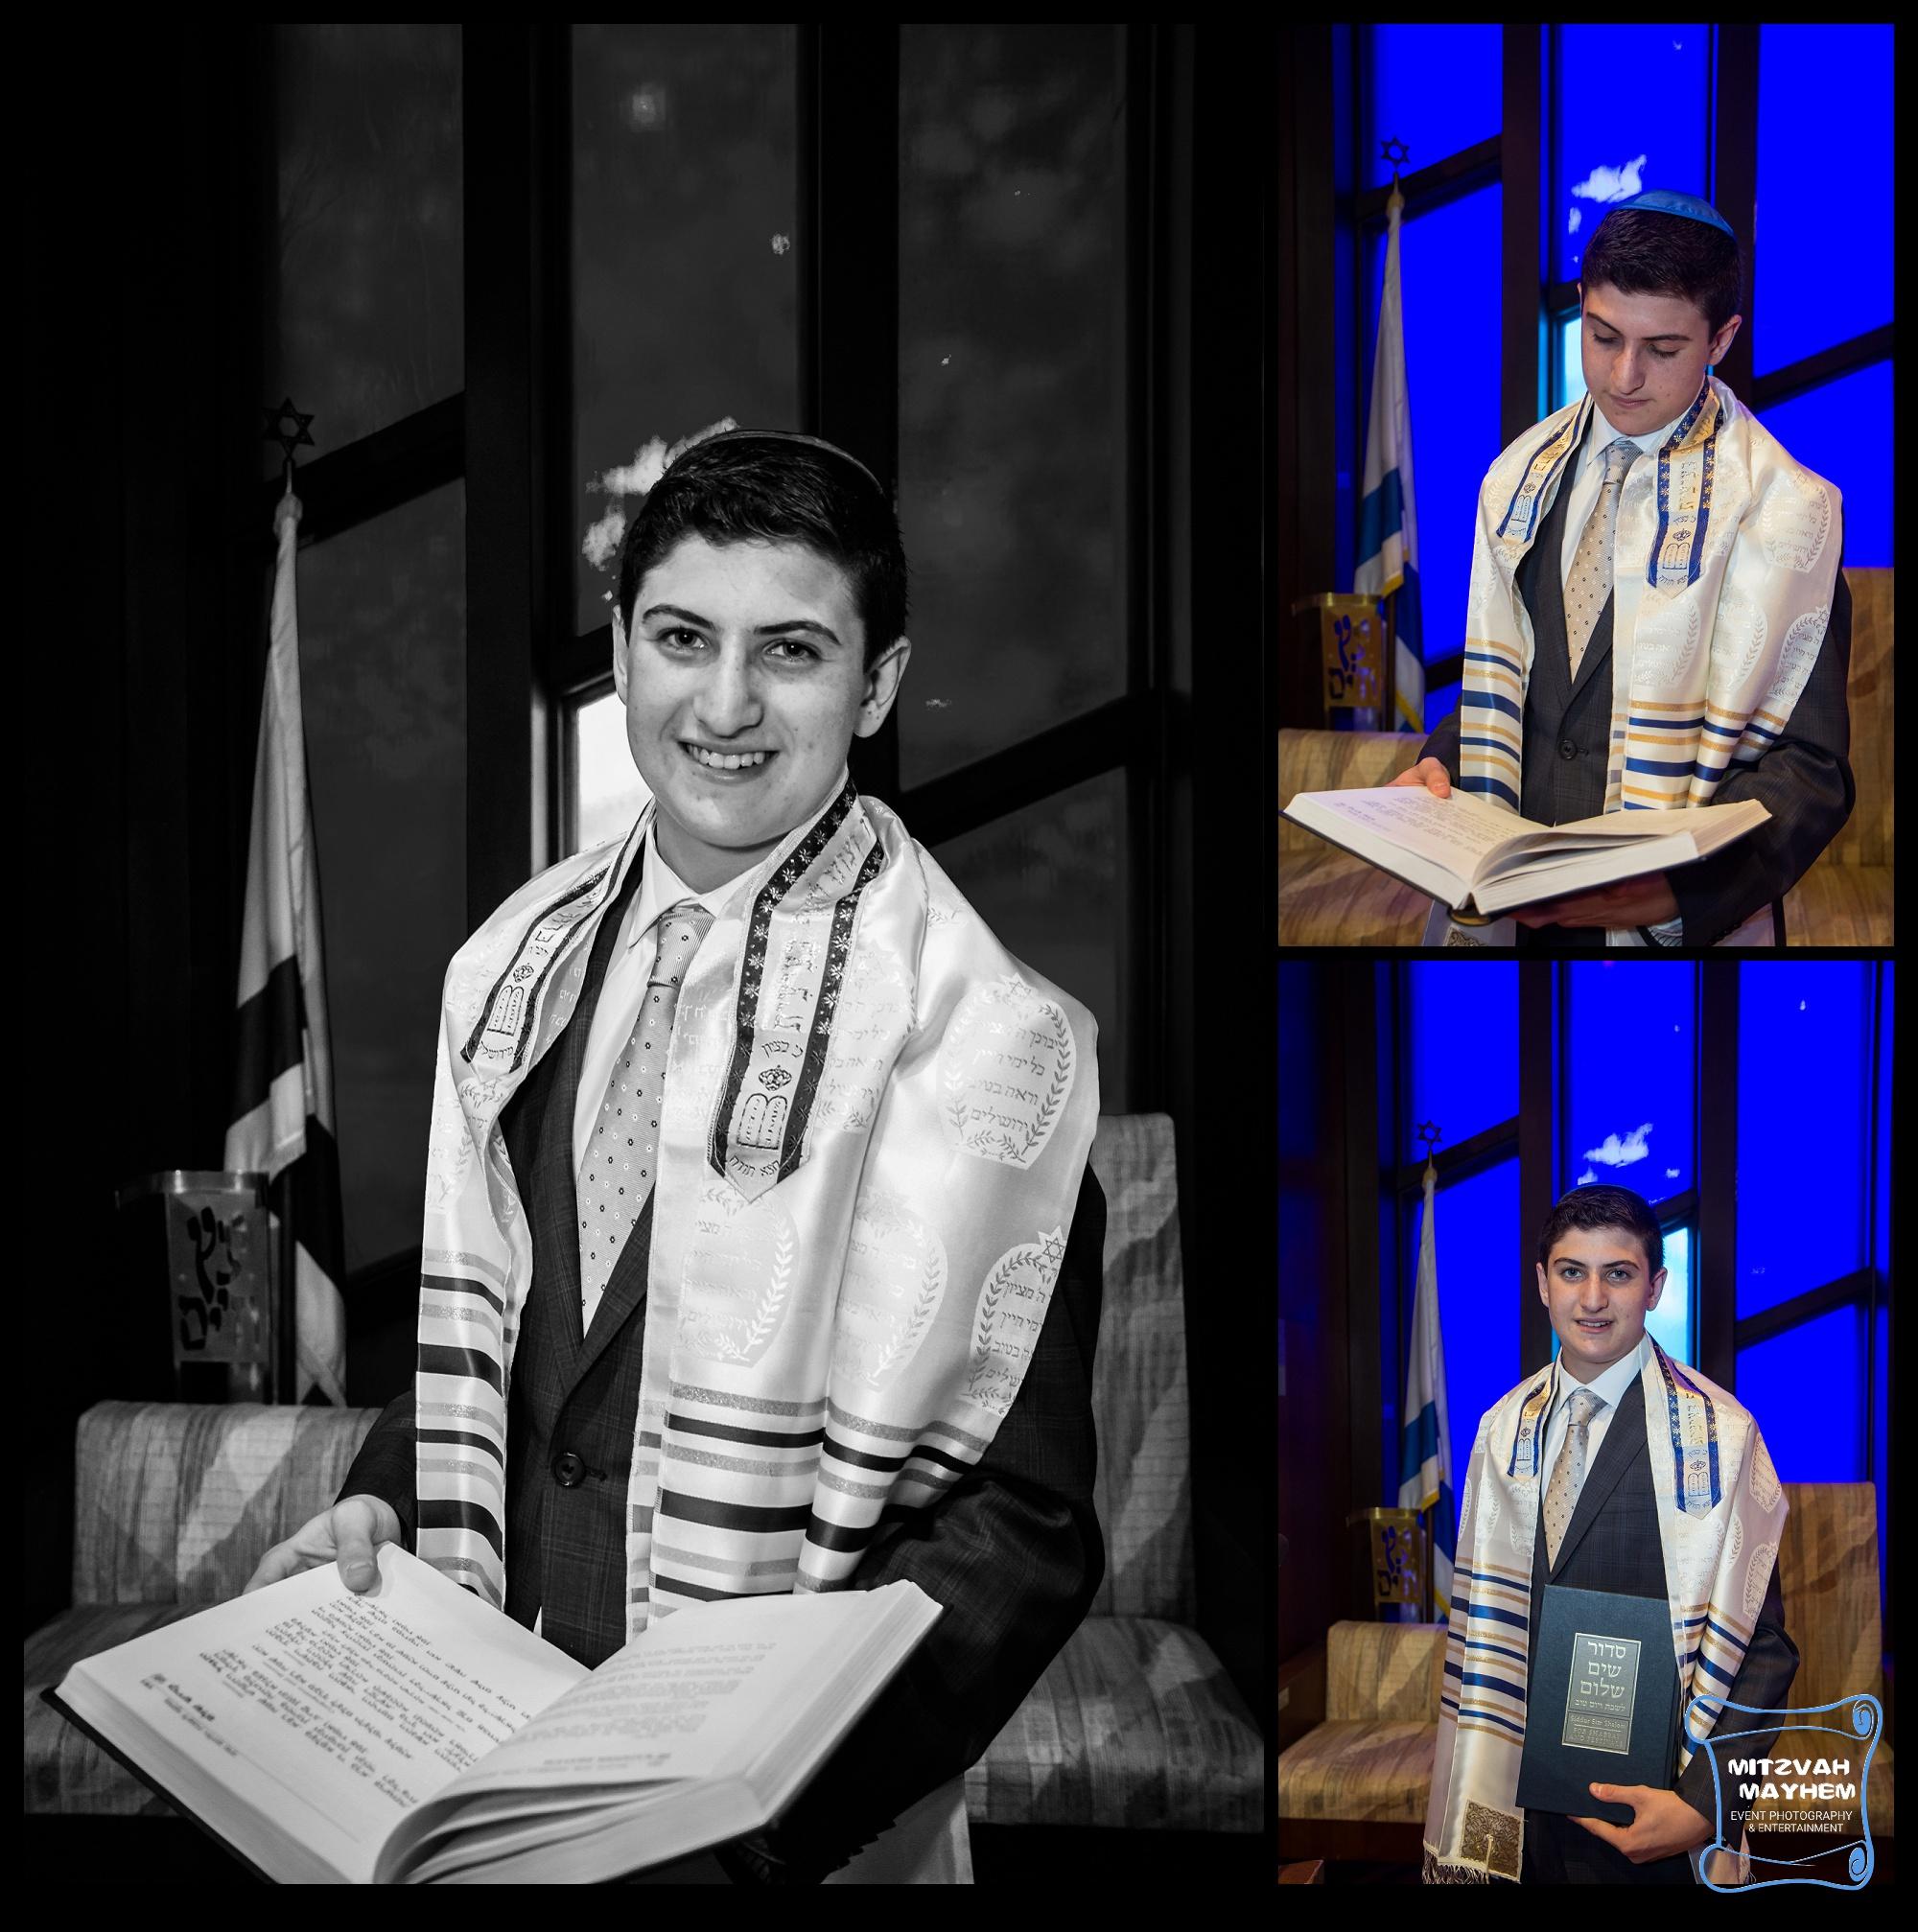 new-jersey-bar-mitzvah-photography-9639.jpg